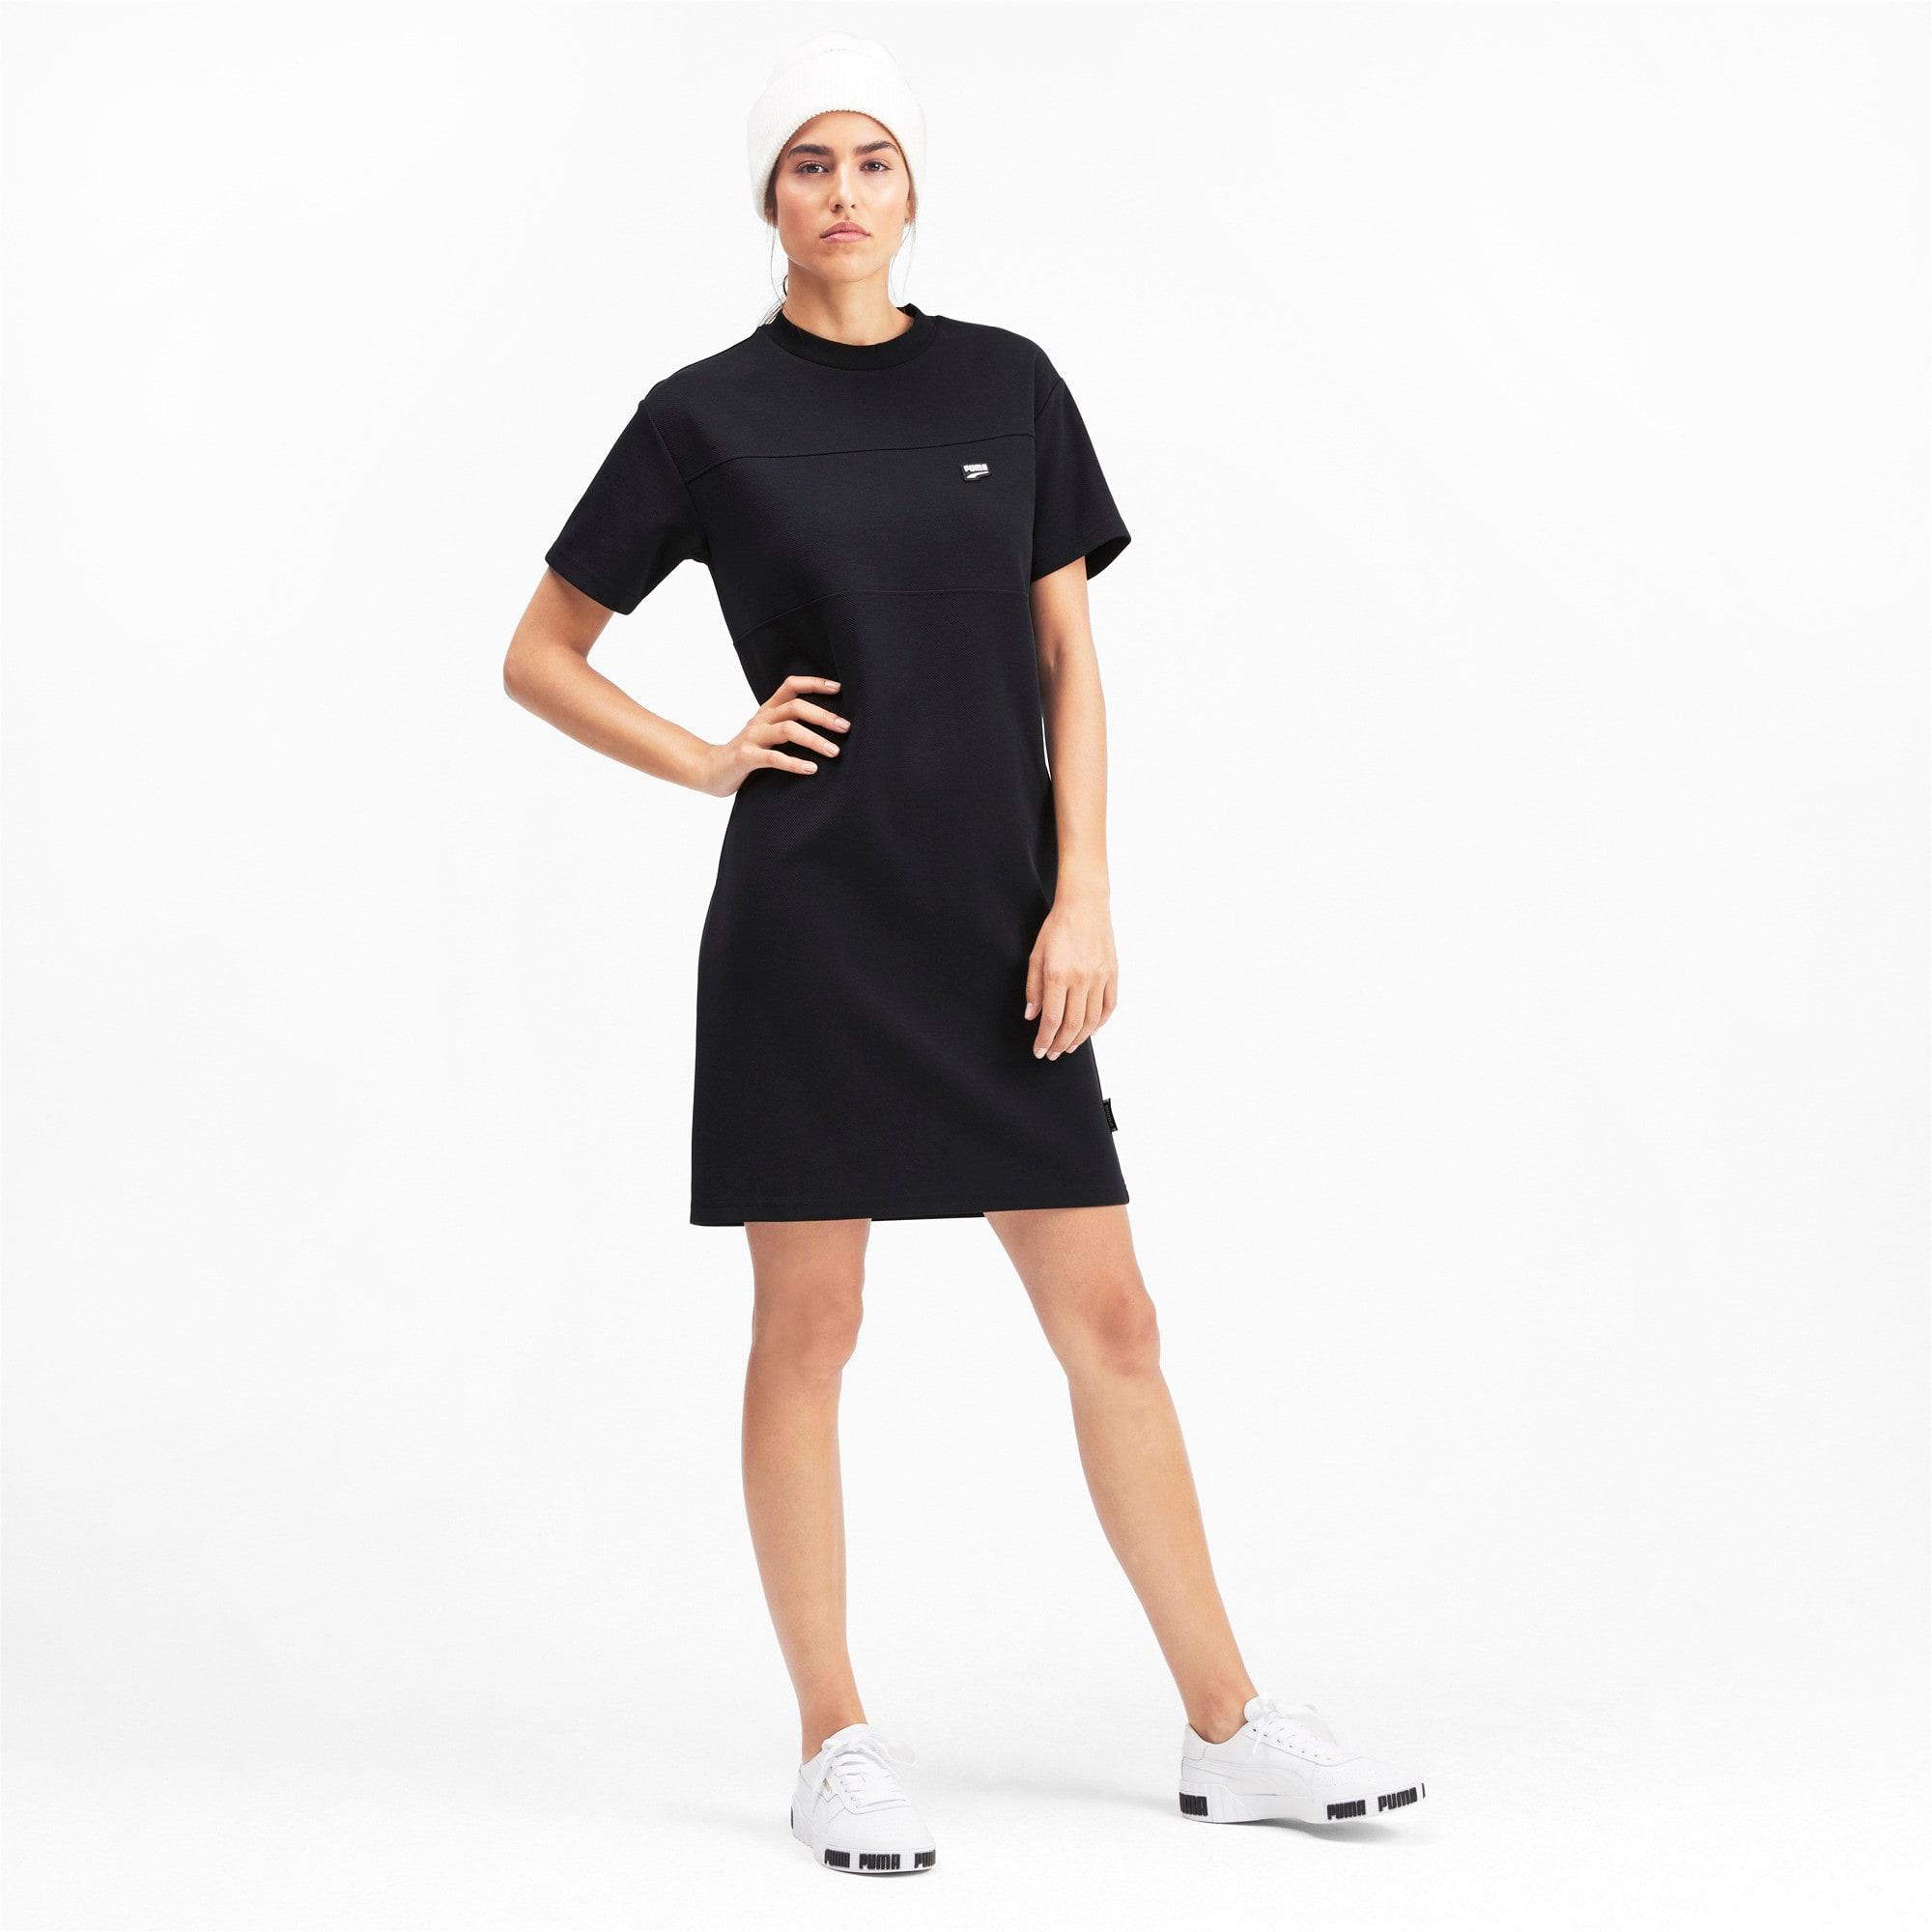 Anteprima 3 di Downtown Women's Dress, Puma Black, medio